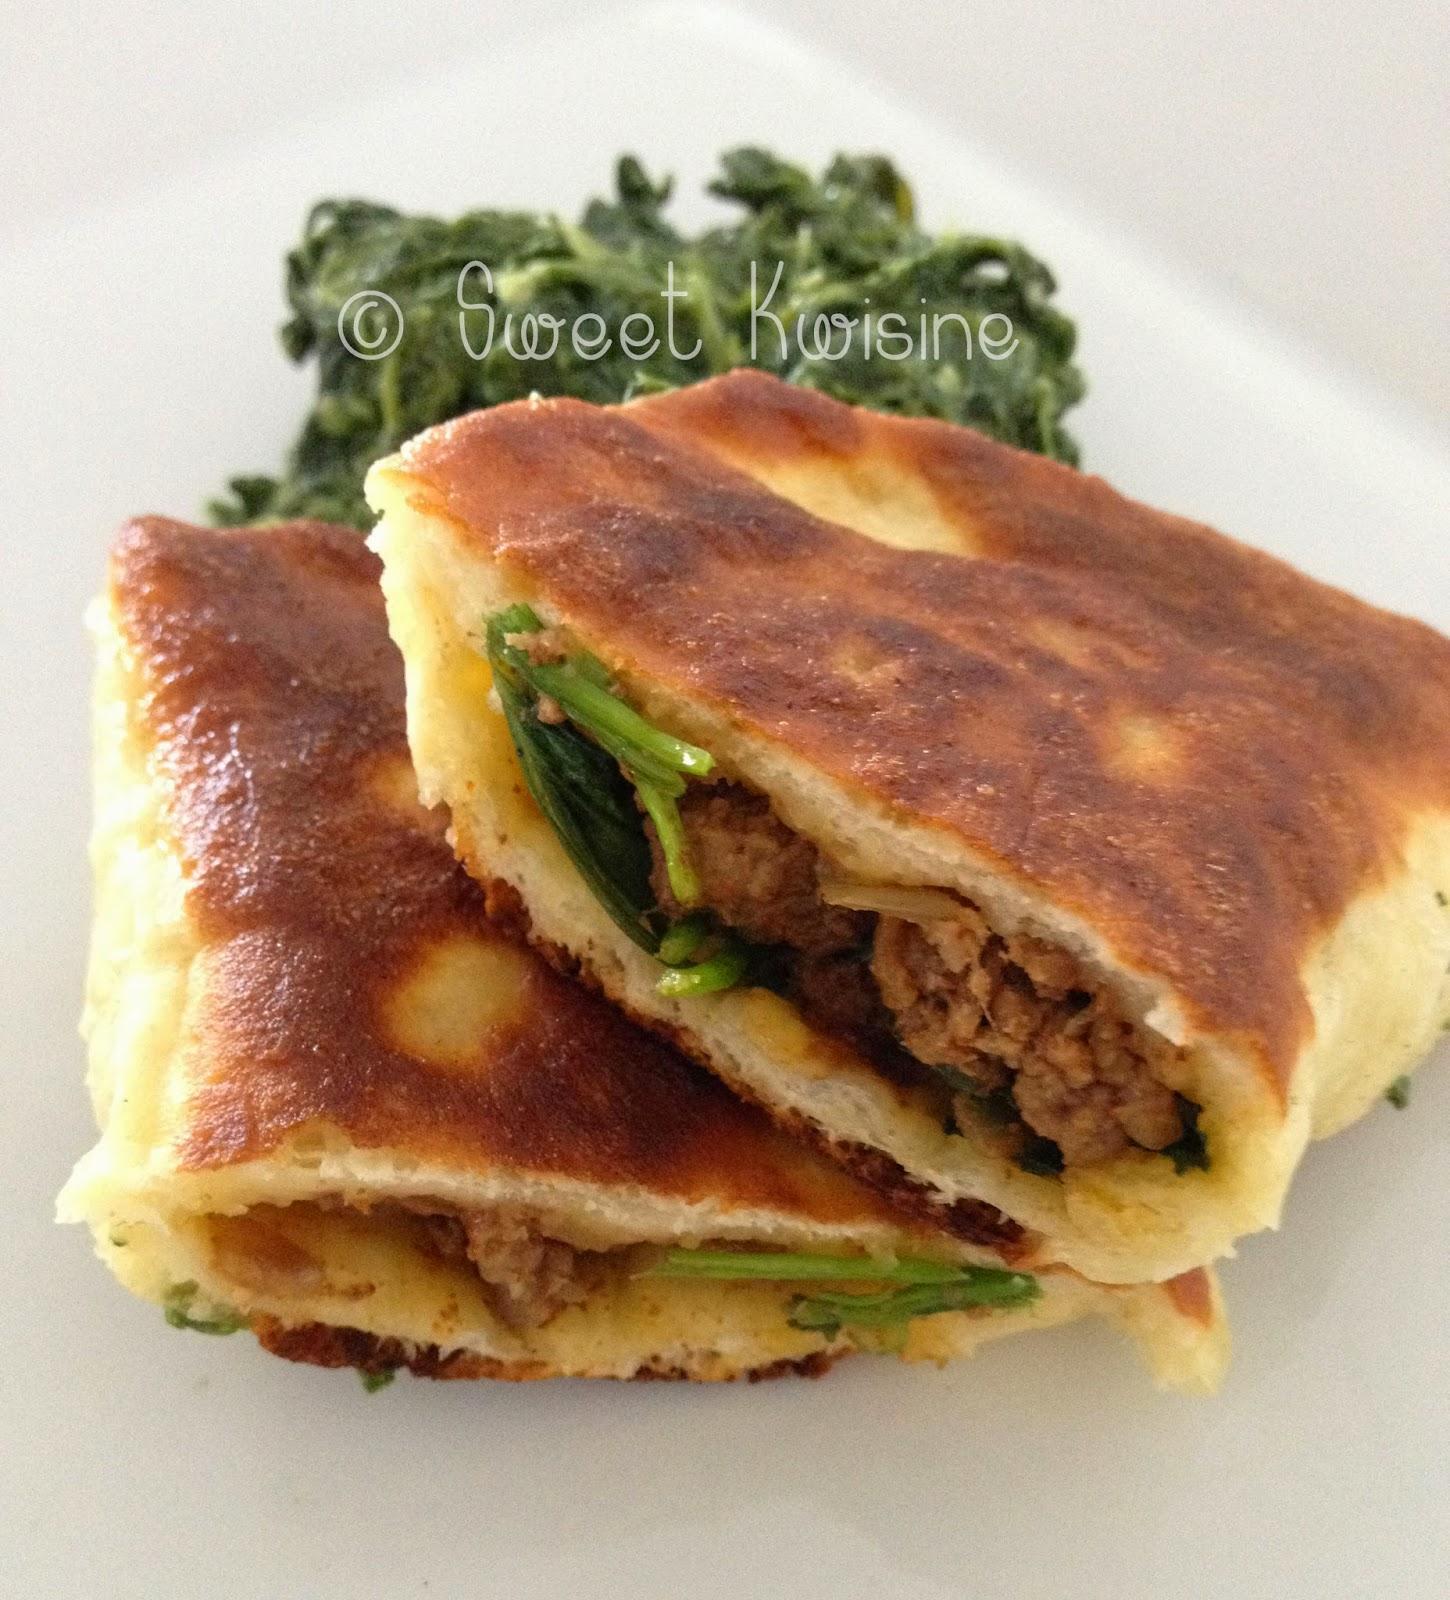 sweet kwisine, cuisine turque, galettes, pain, épinards, viande de boeuf, persil, coriandre, streetfood